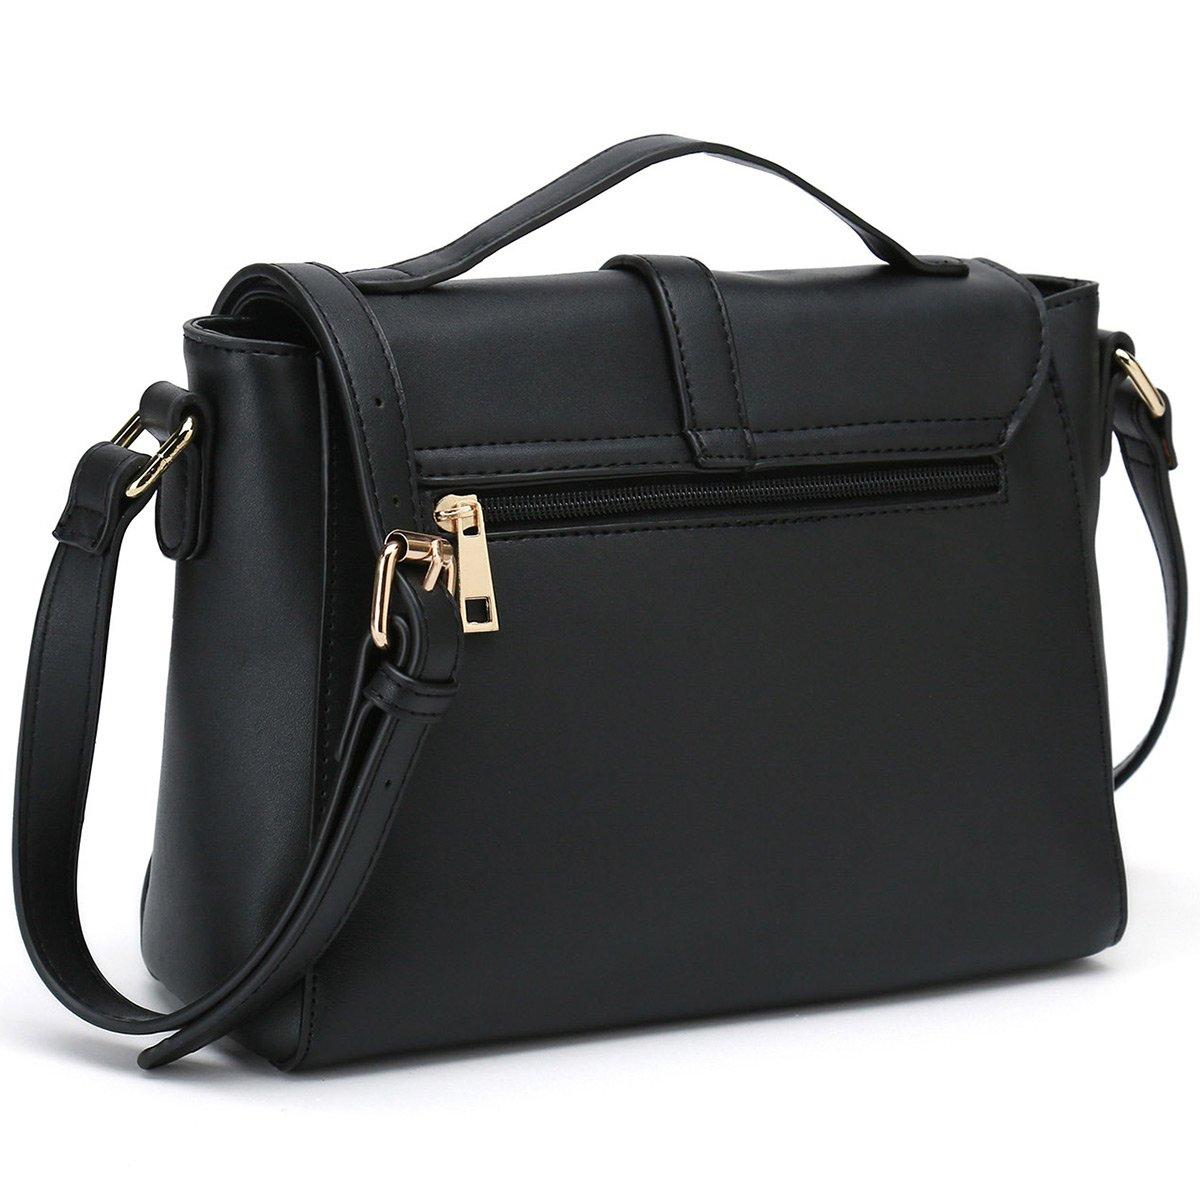 aa20aa7d751c Ladies Designer Purses Cross Body Handbags Trendy Bags for Women Shoulder  Bags (Black)  Handbags  Amazon.com